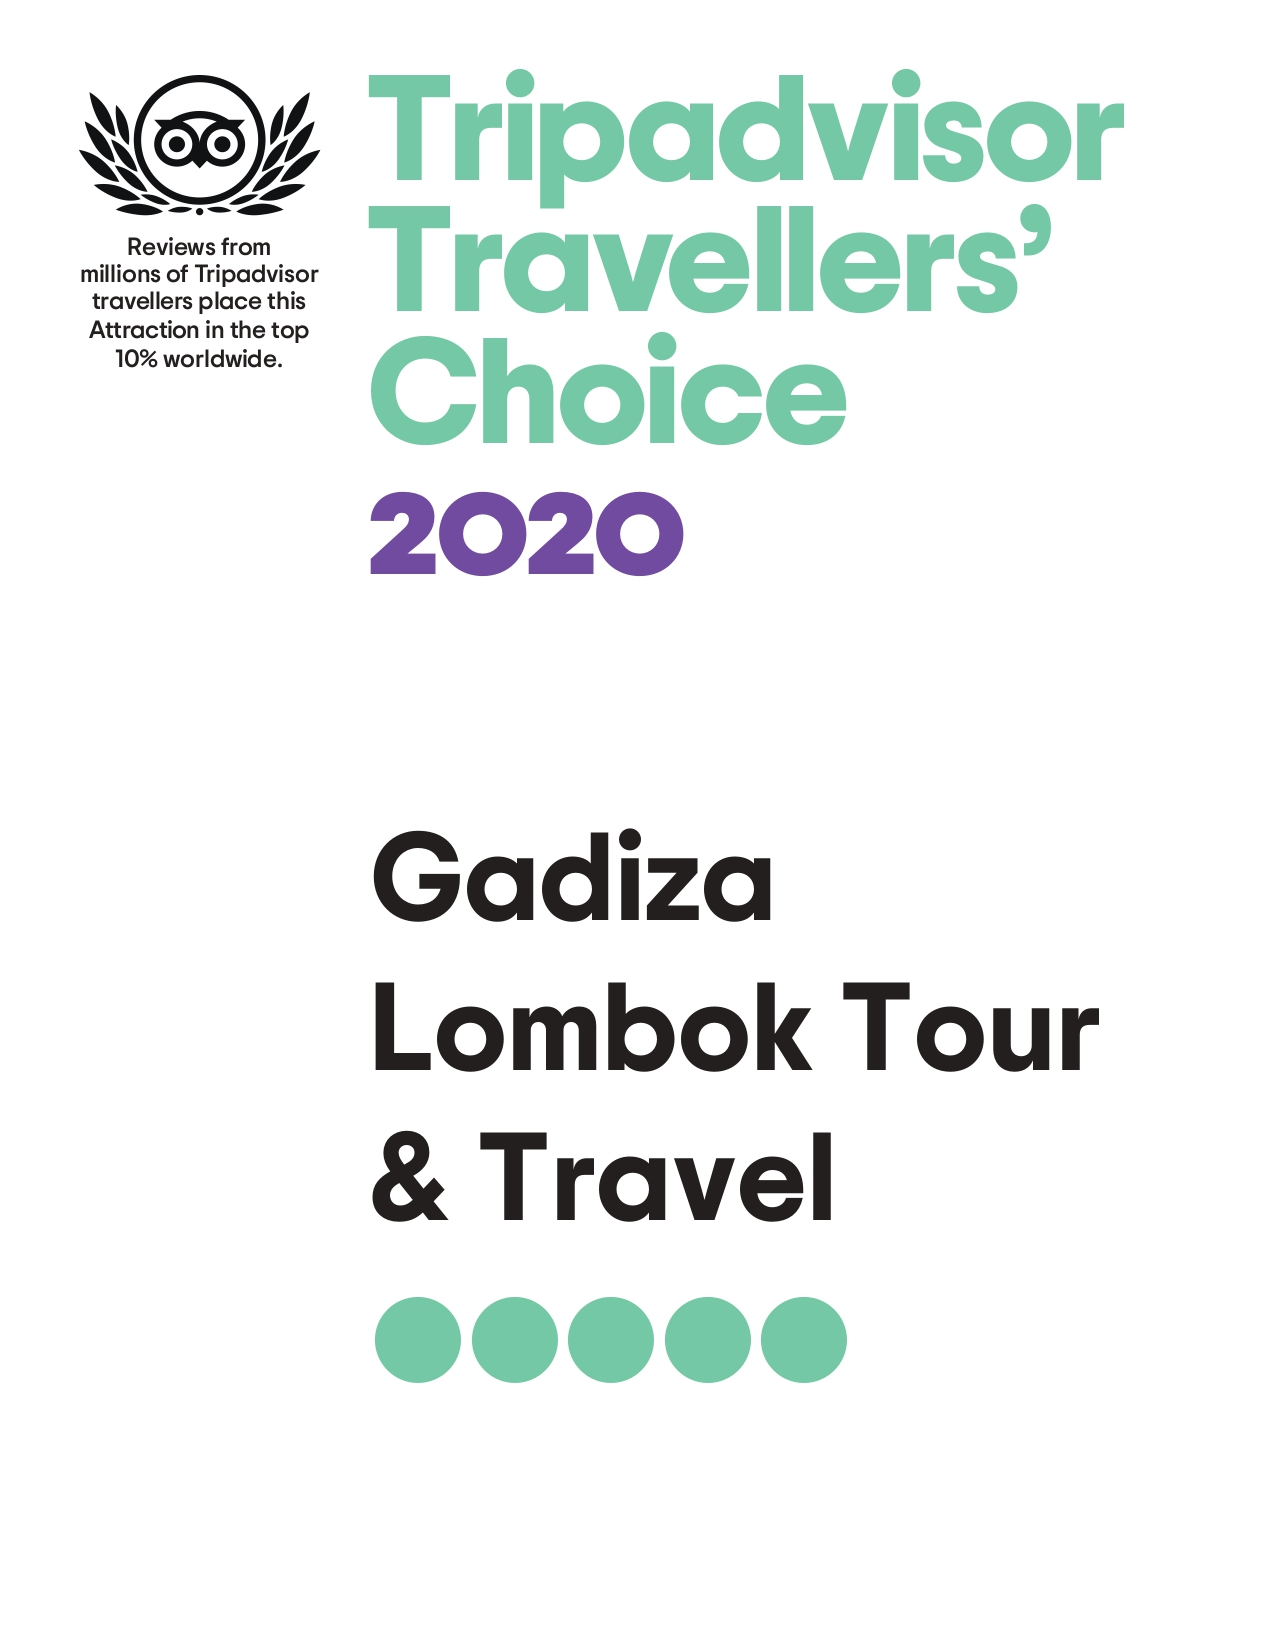 Tripadvisor Gadiza Lombok